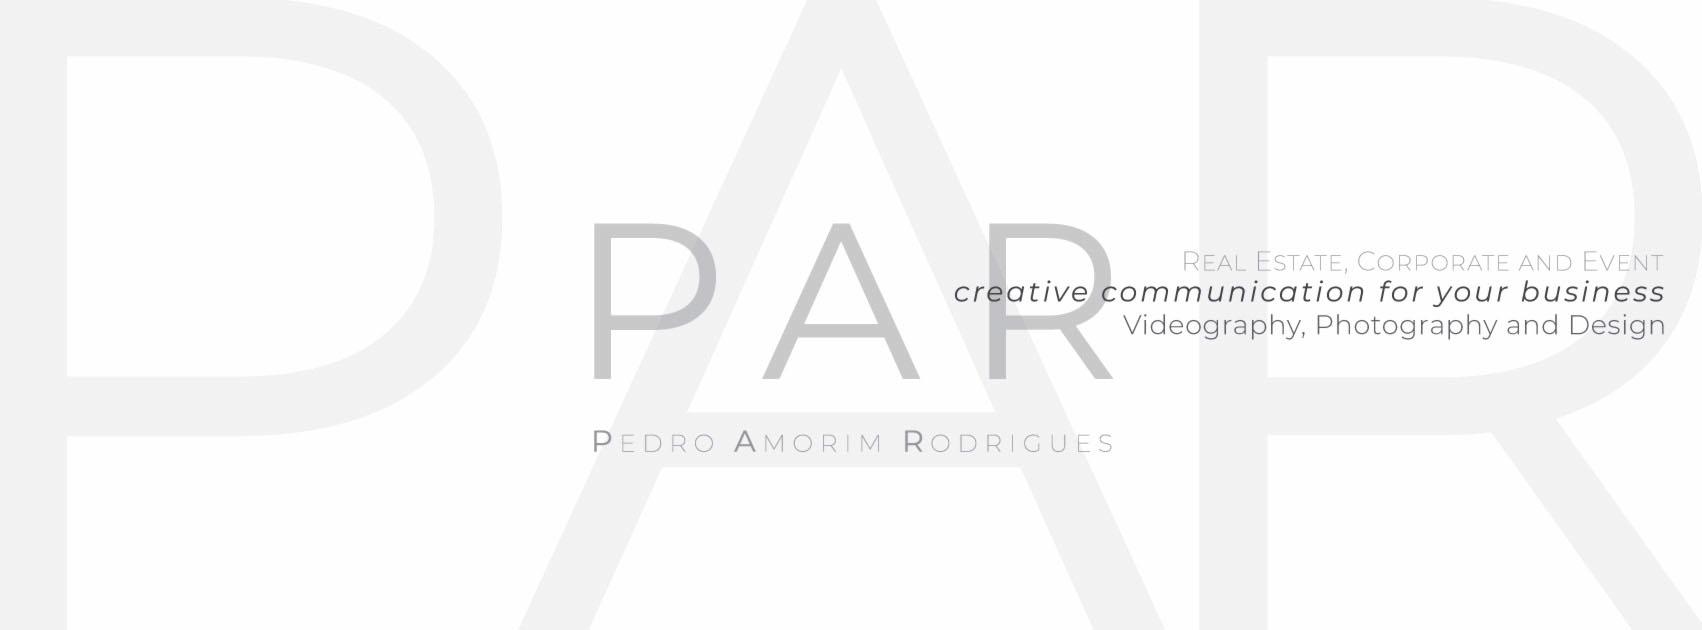 Pedro Amorim Rodrigues